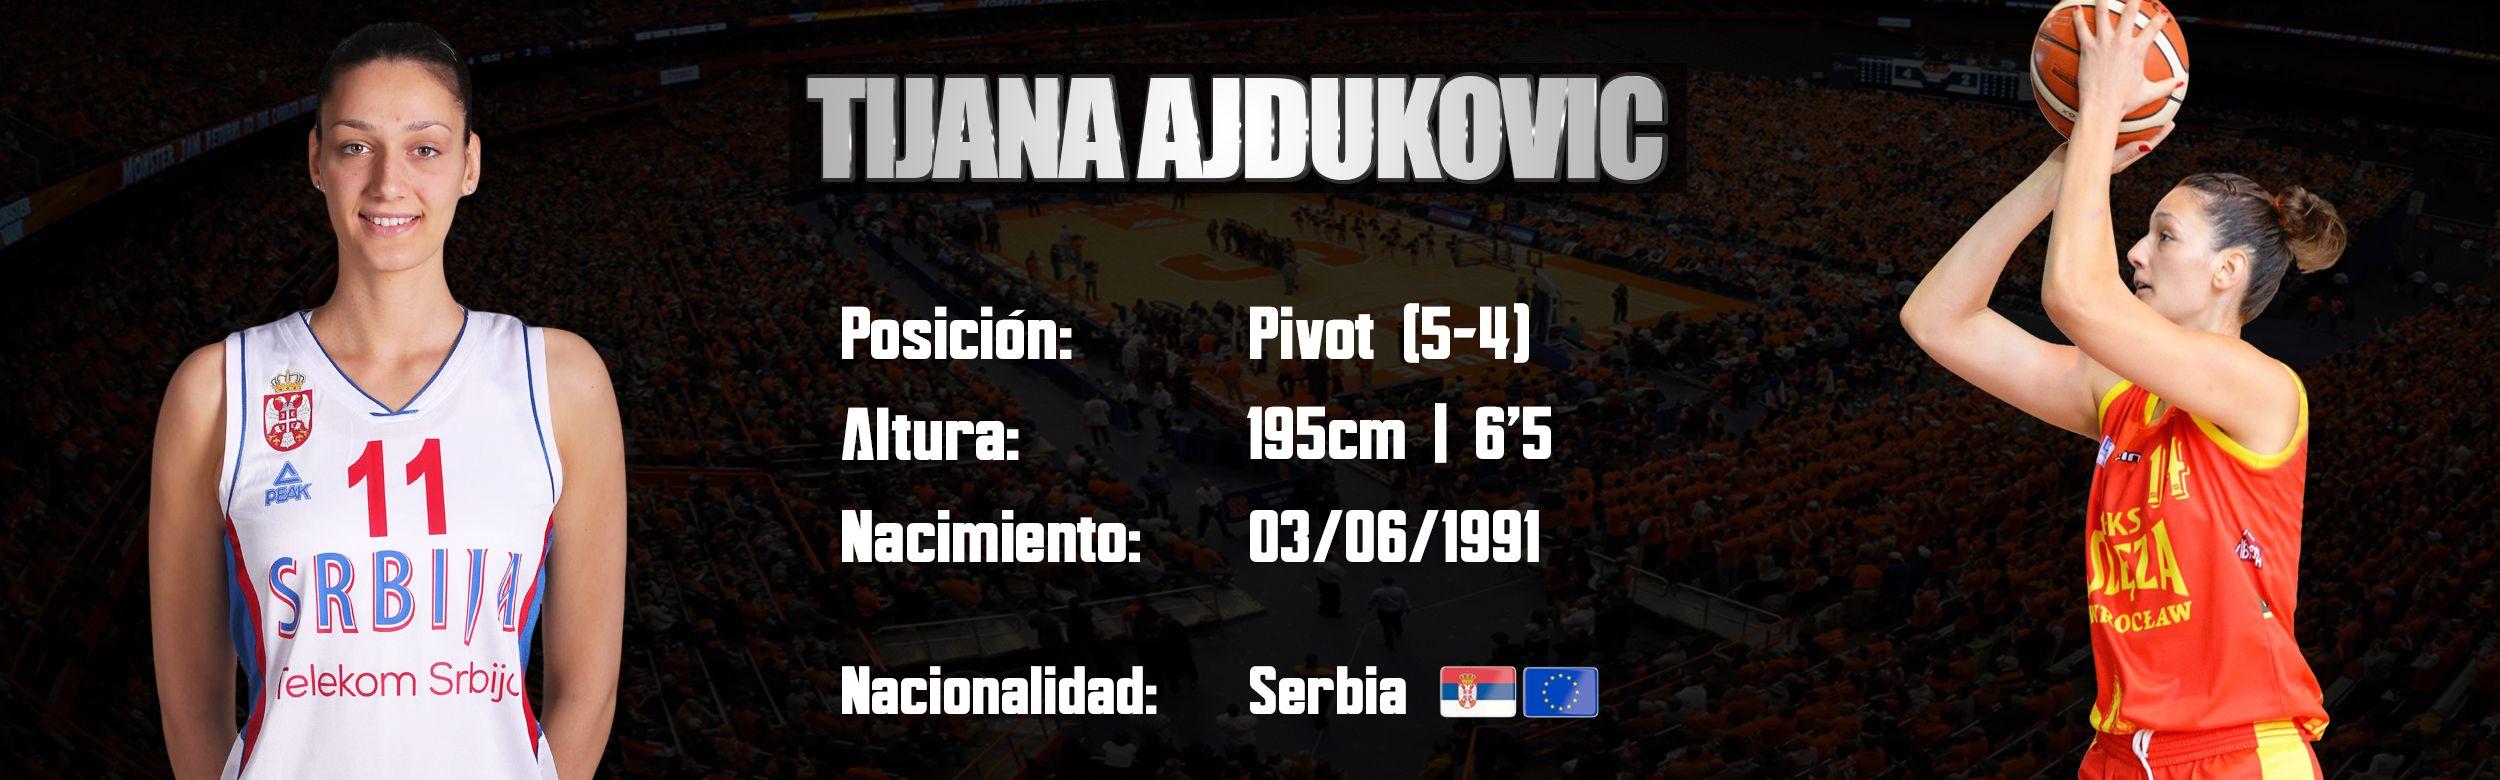 Tijana Ajdukovic (Andusic)